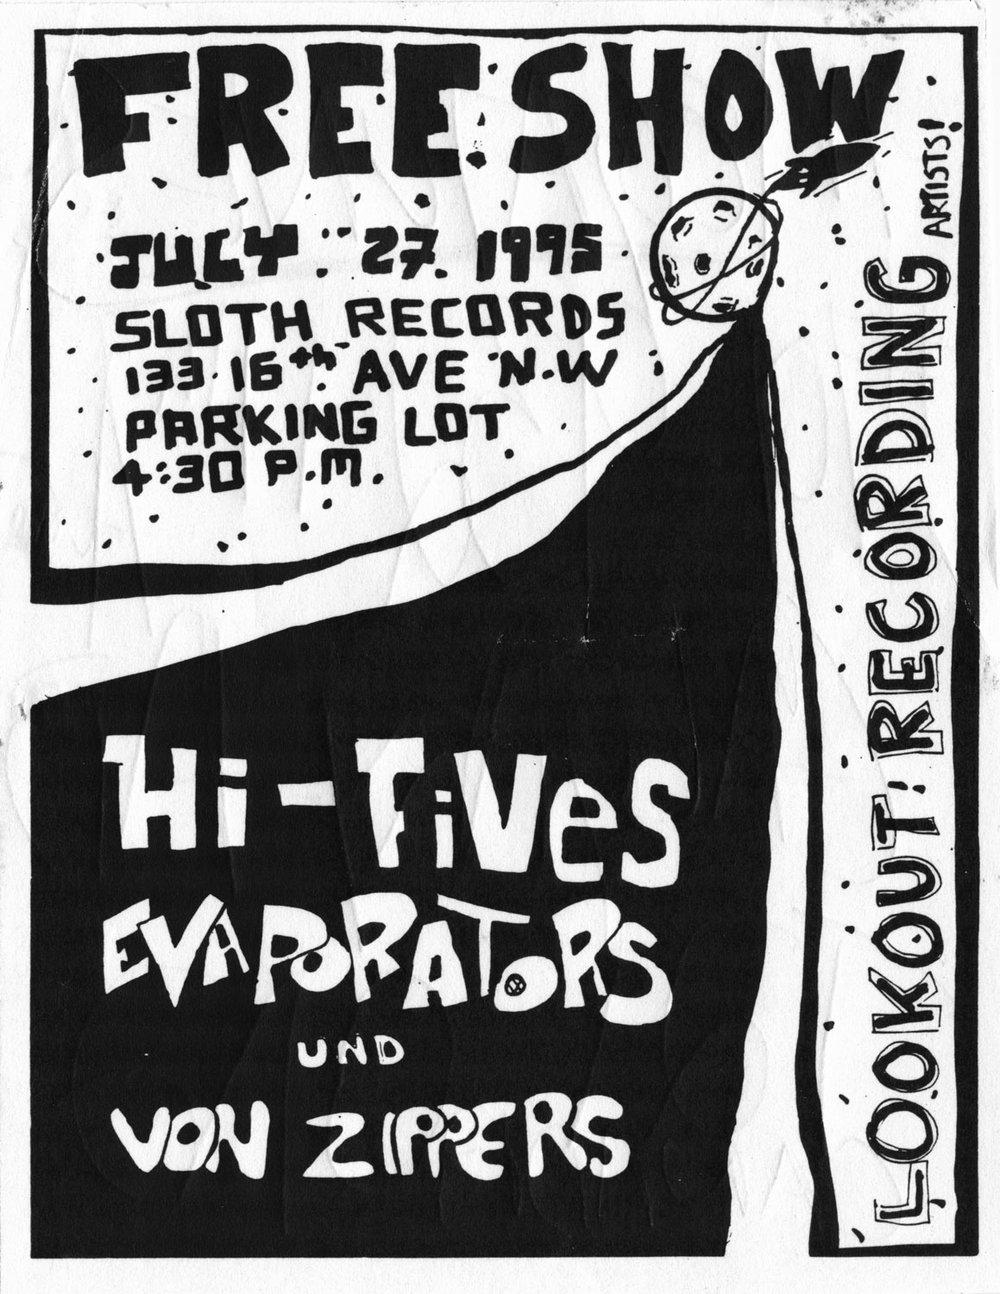 7/27/1995